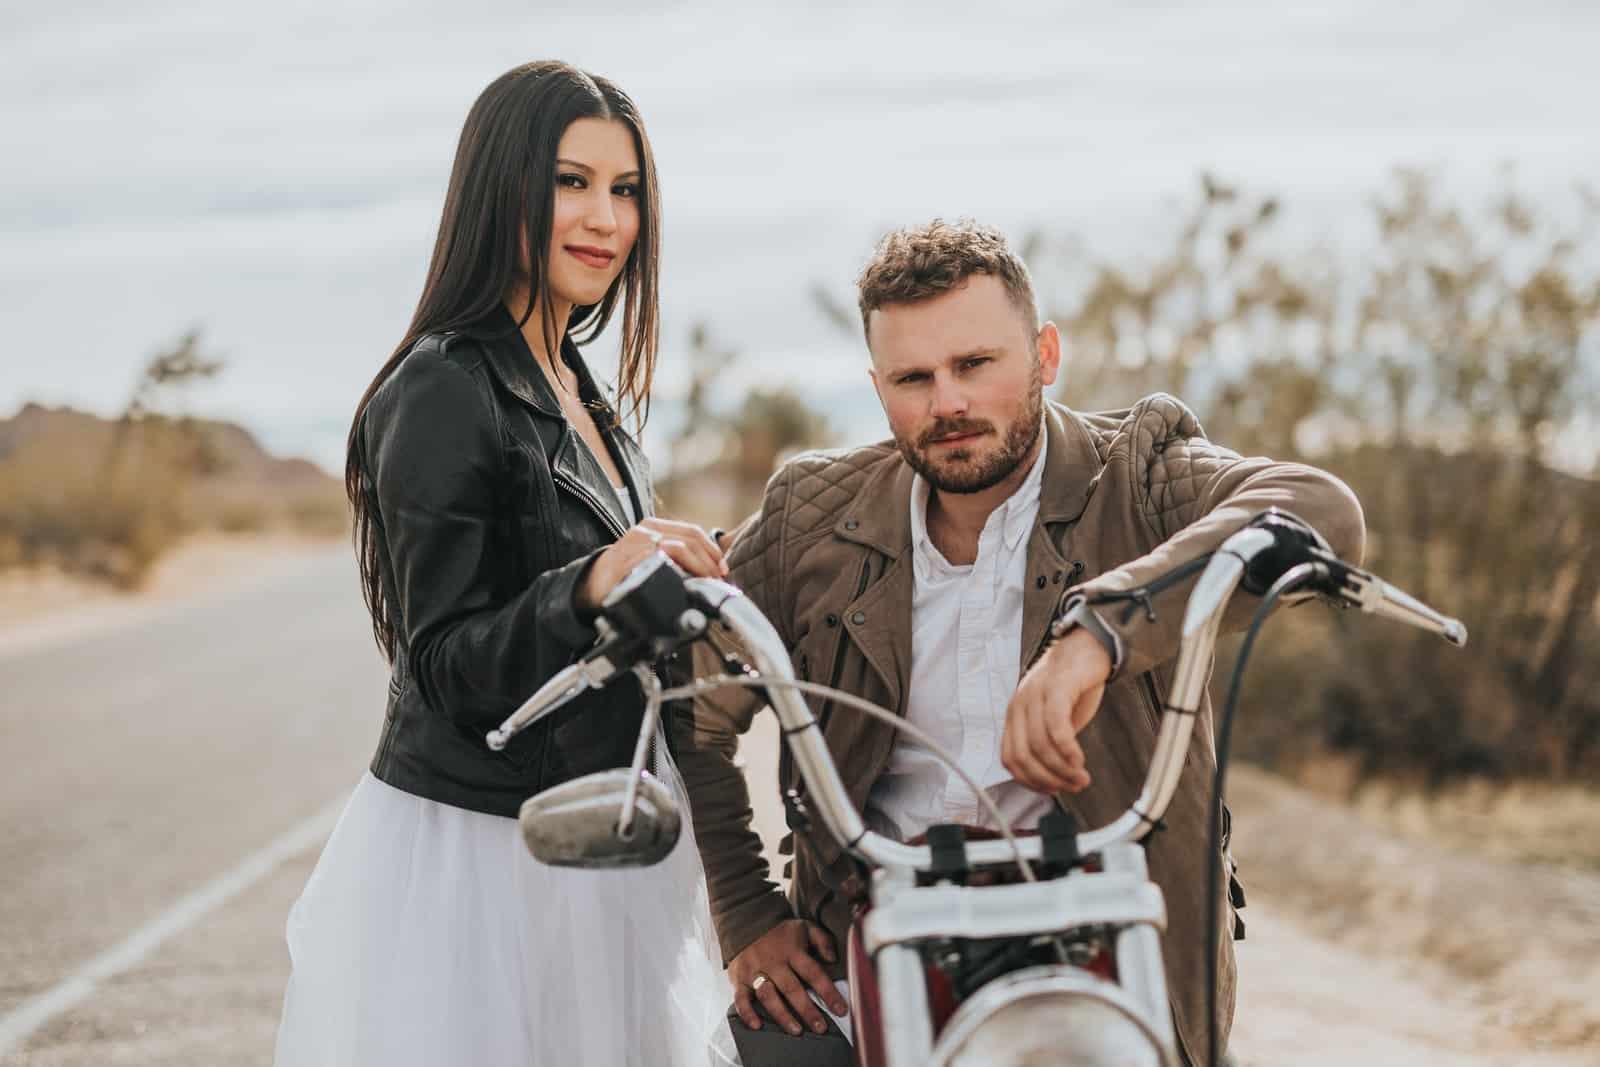 man sitting on motorcycle beside woman